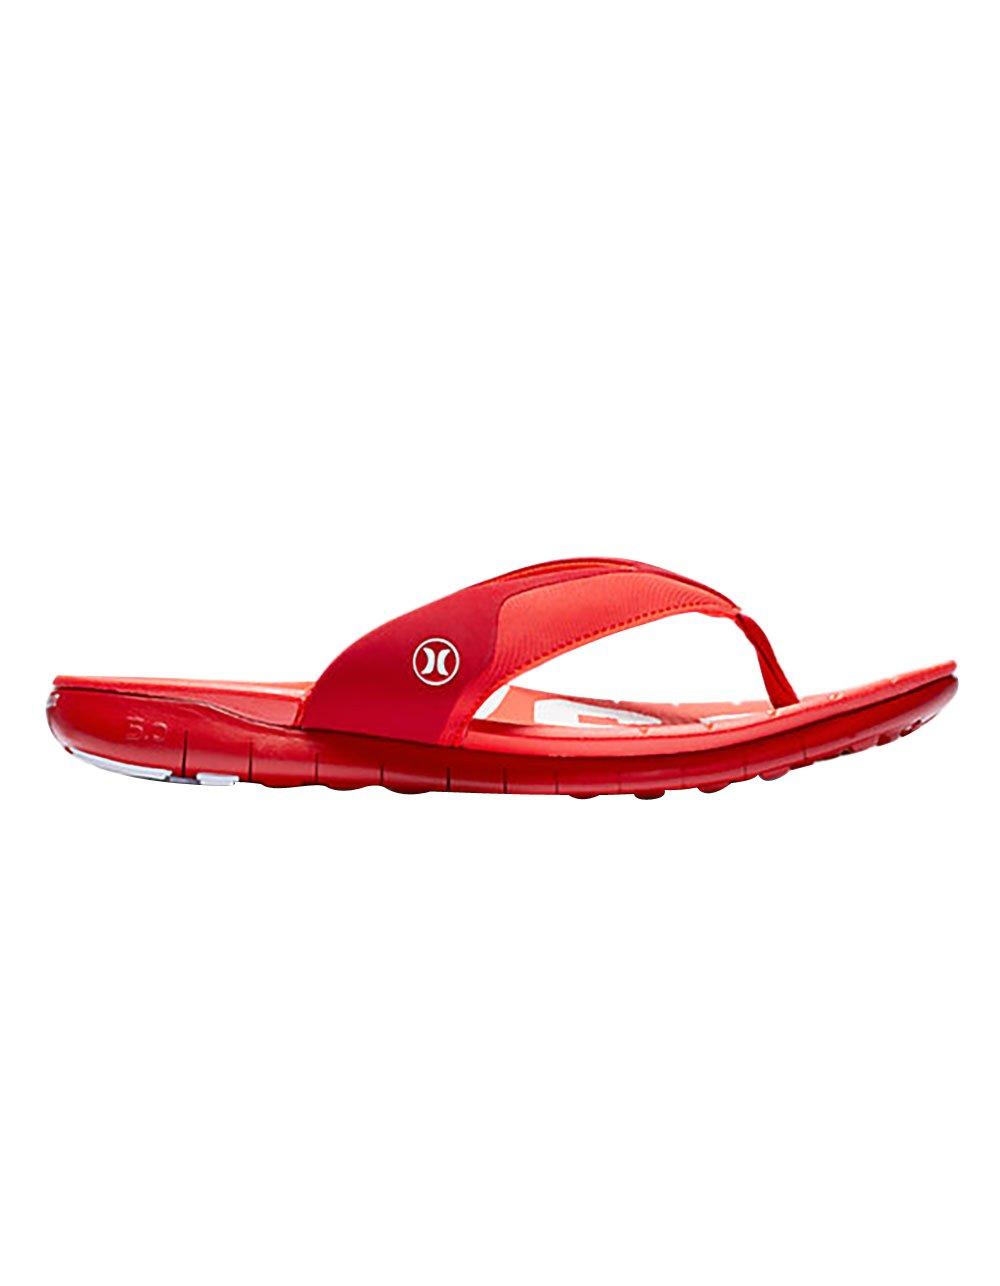 Hurley メンズ Hurley Mens Phantom Free (USA) Sandals B01JQBHCX6 16 D(M) US ジムレッド(Gym Red)